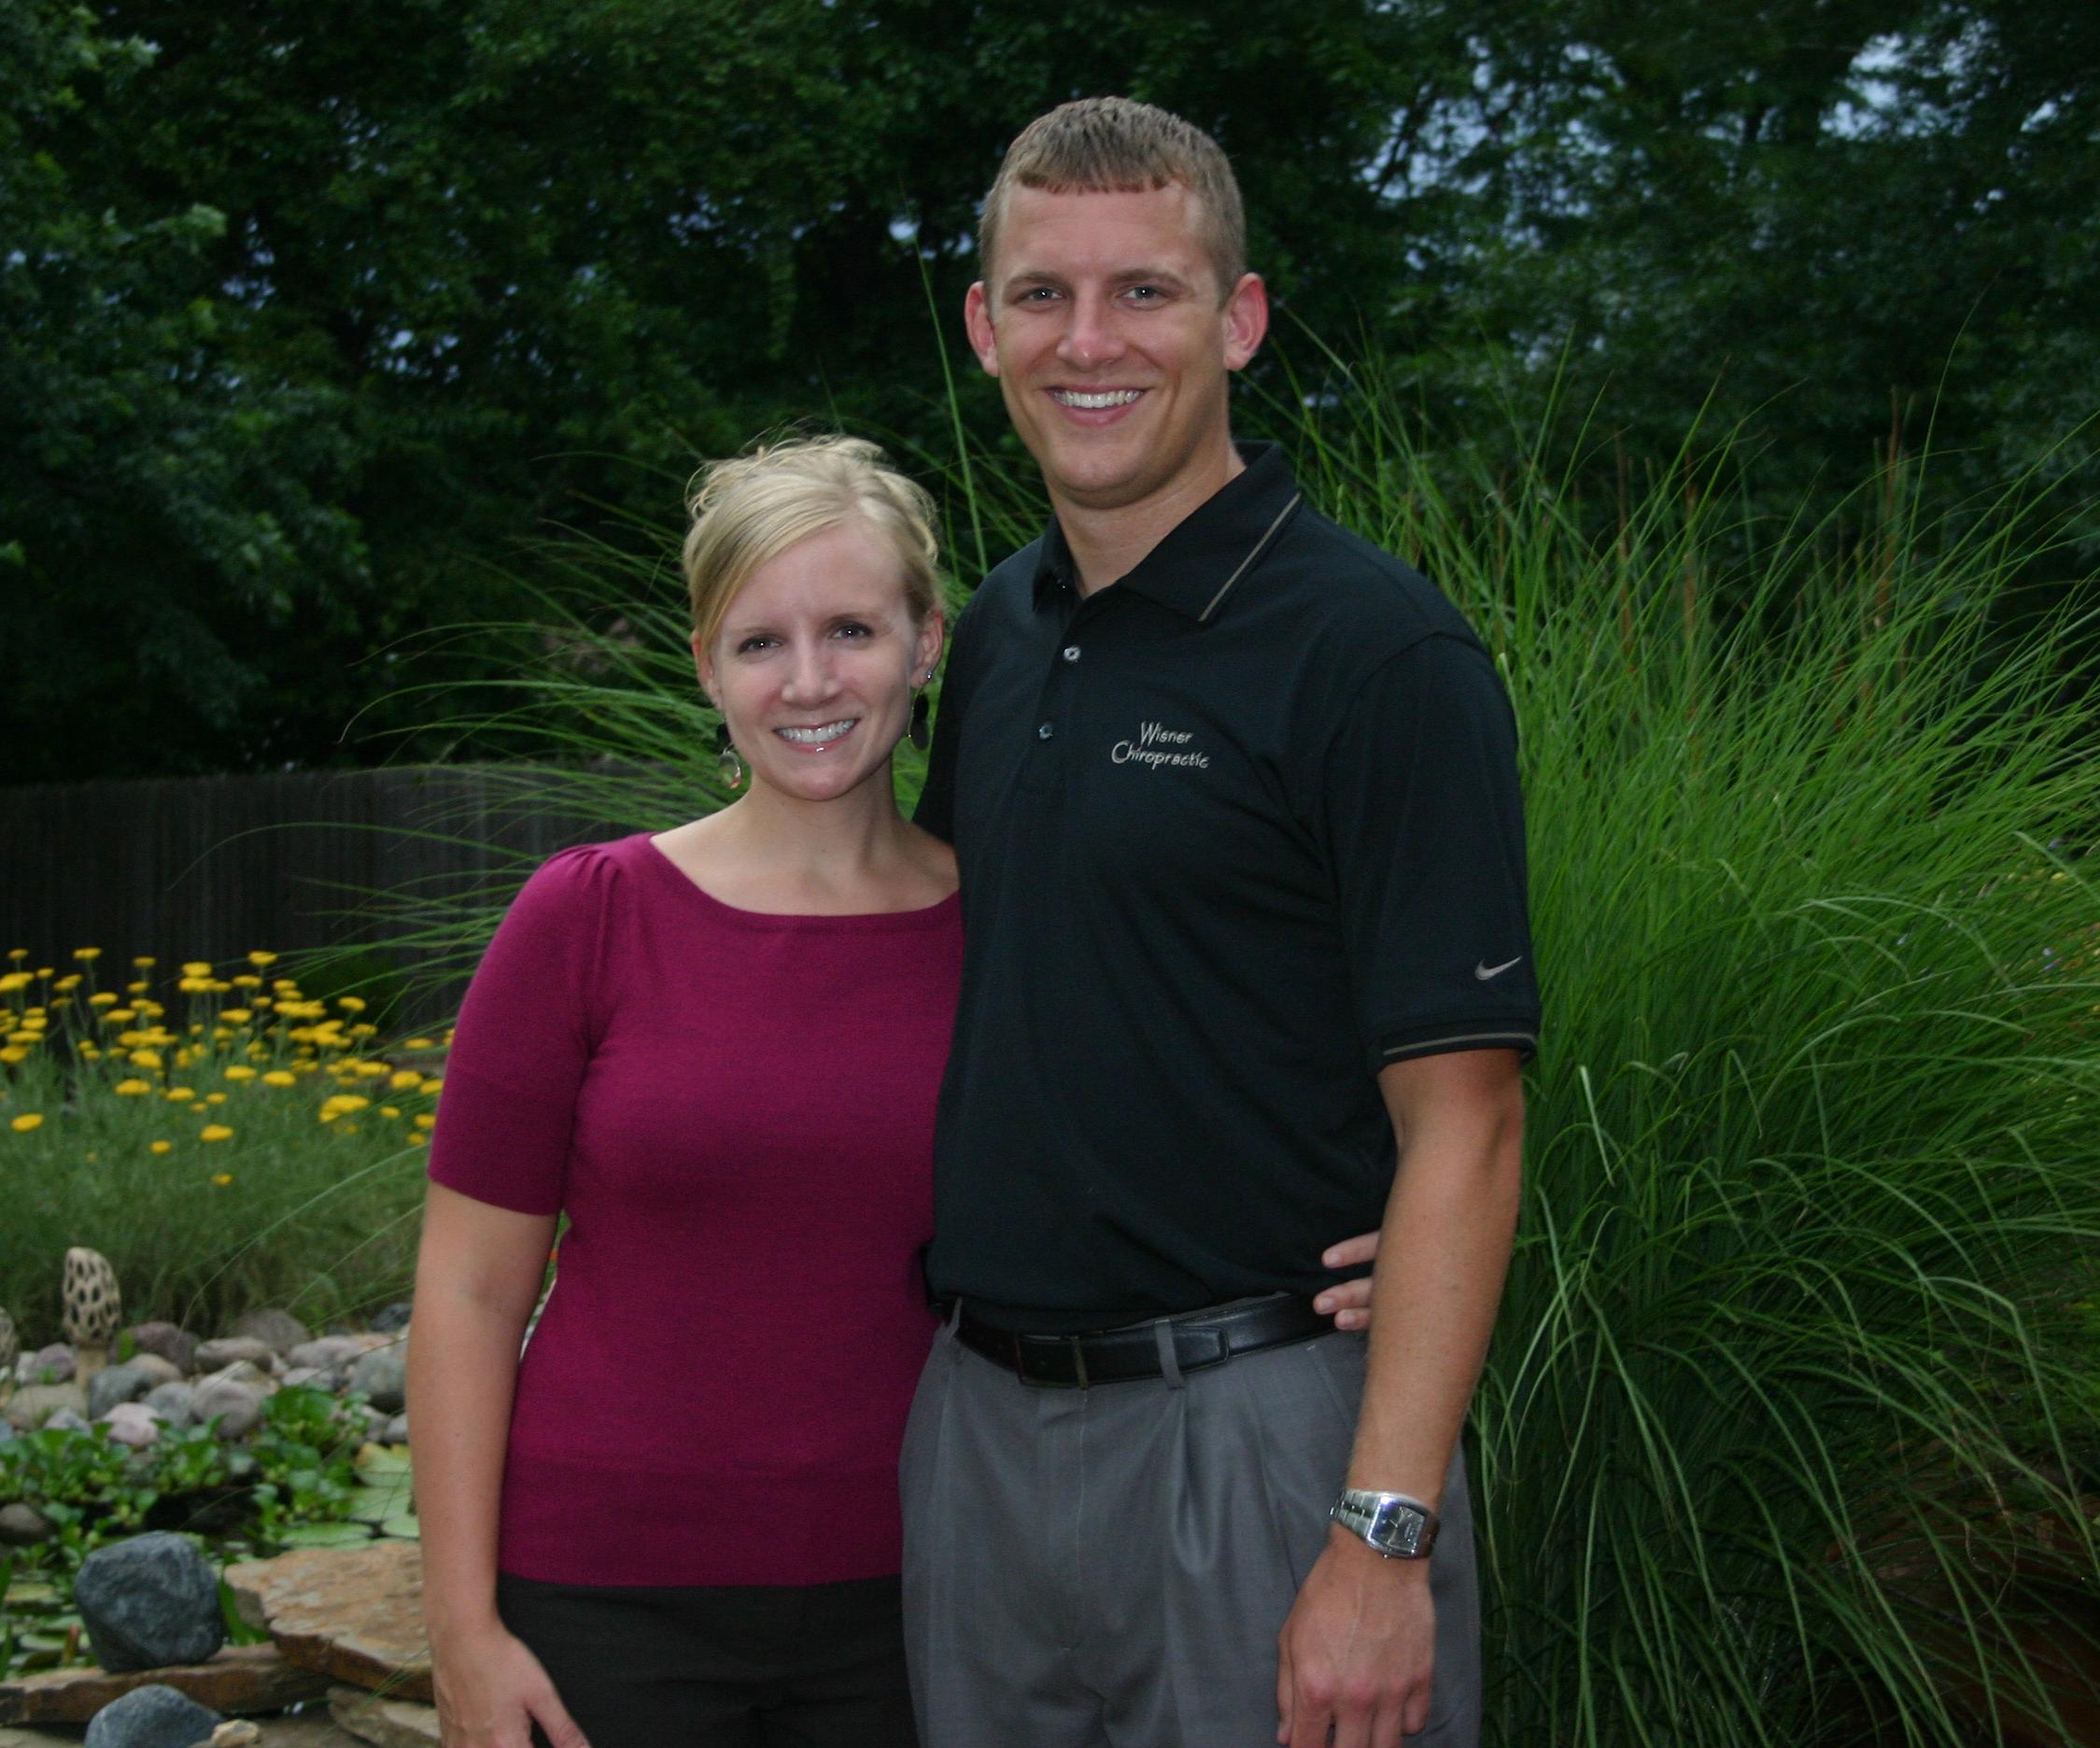 Welcome To Wisner Chiropractic Jared And Arleycrop Is Located In Overland Park KS